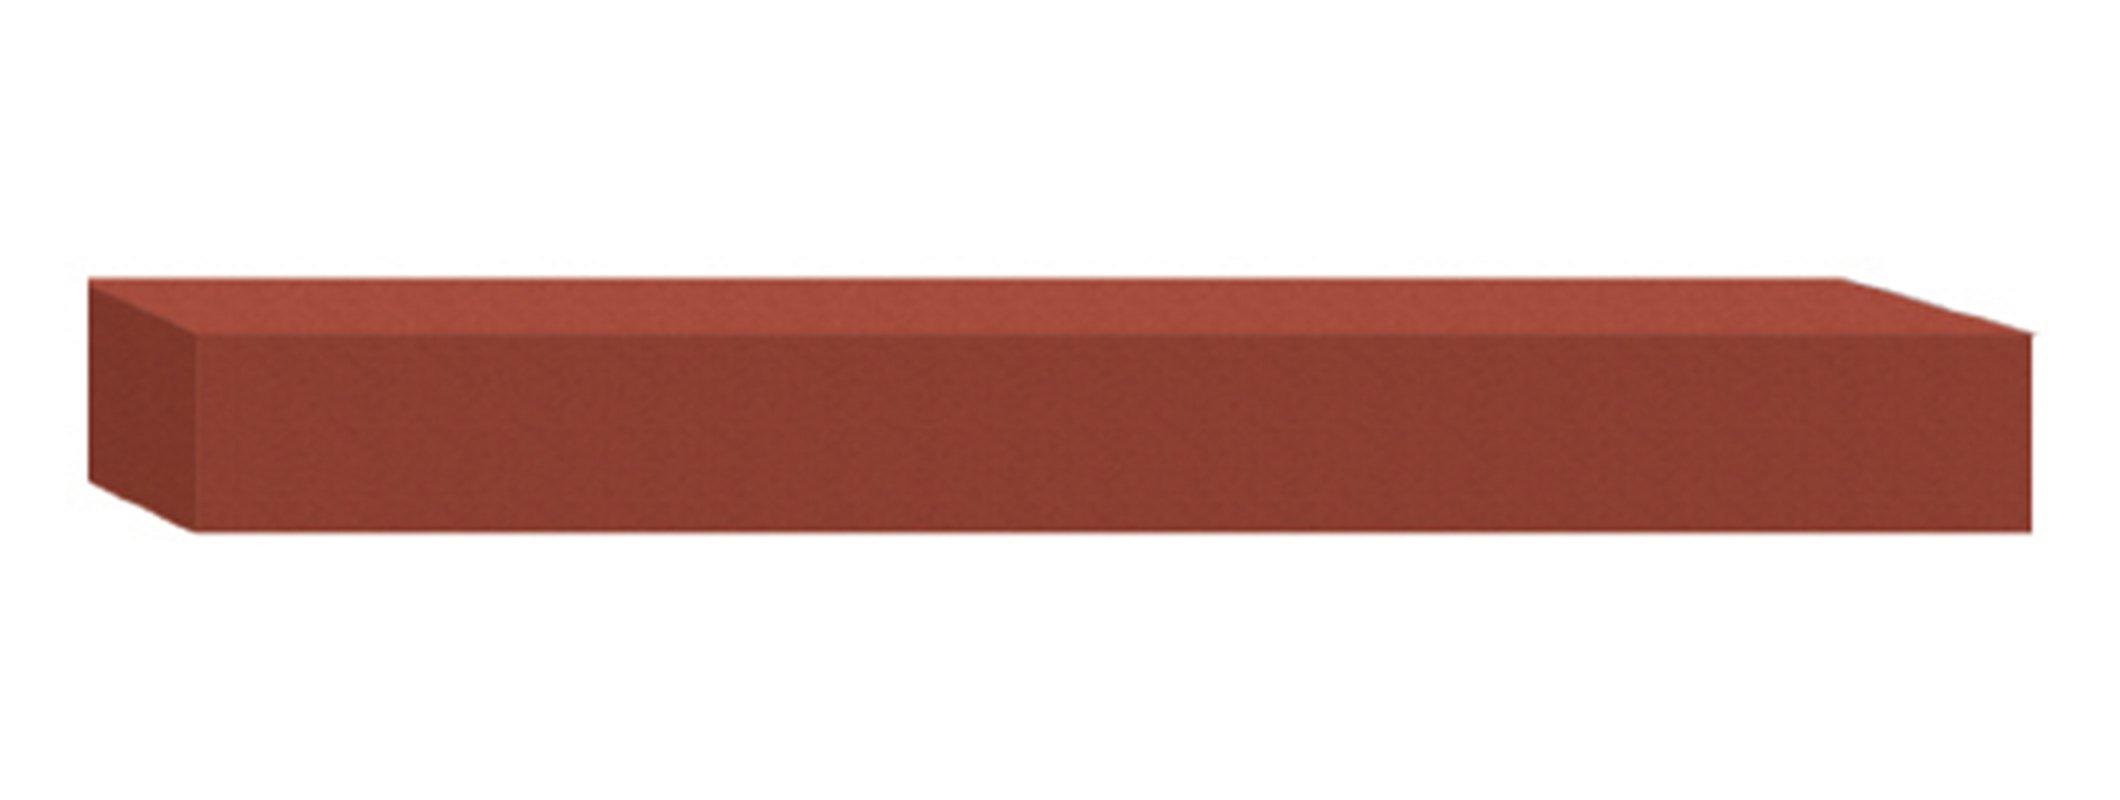 Dedeco 0233 Rubberized Abrasive Block//Stick Medium Silicon Carbide 6 x 5//16 Round Green